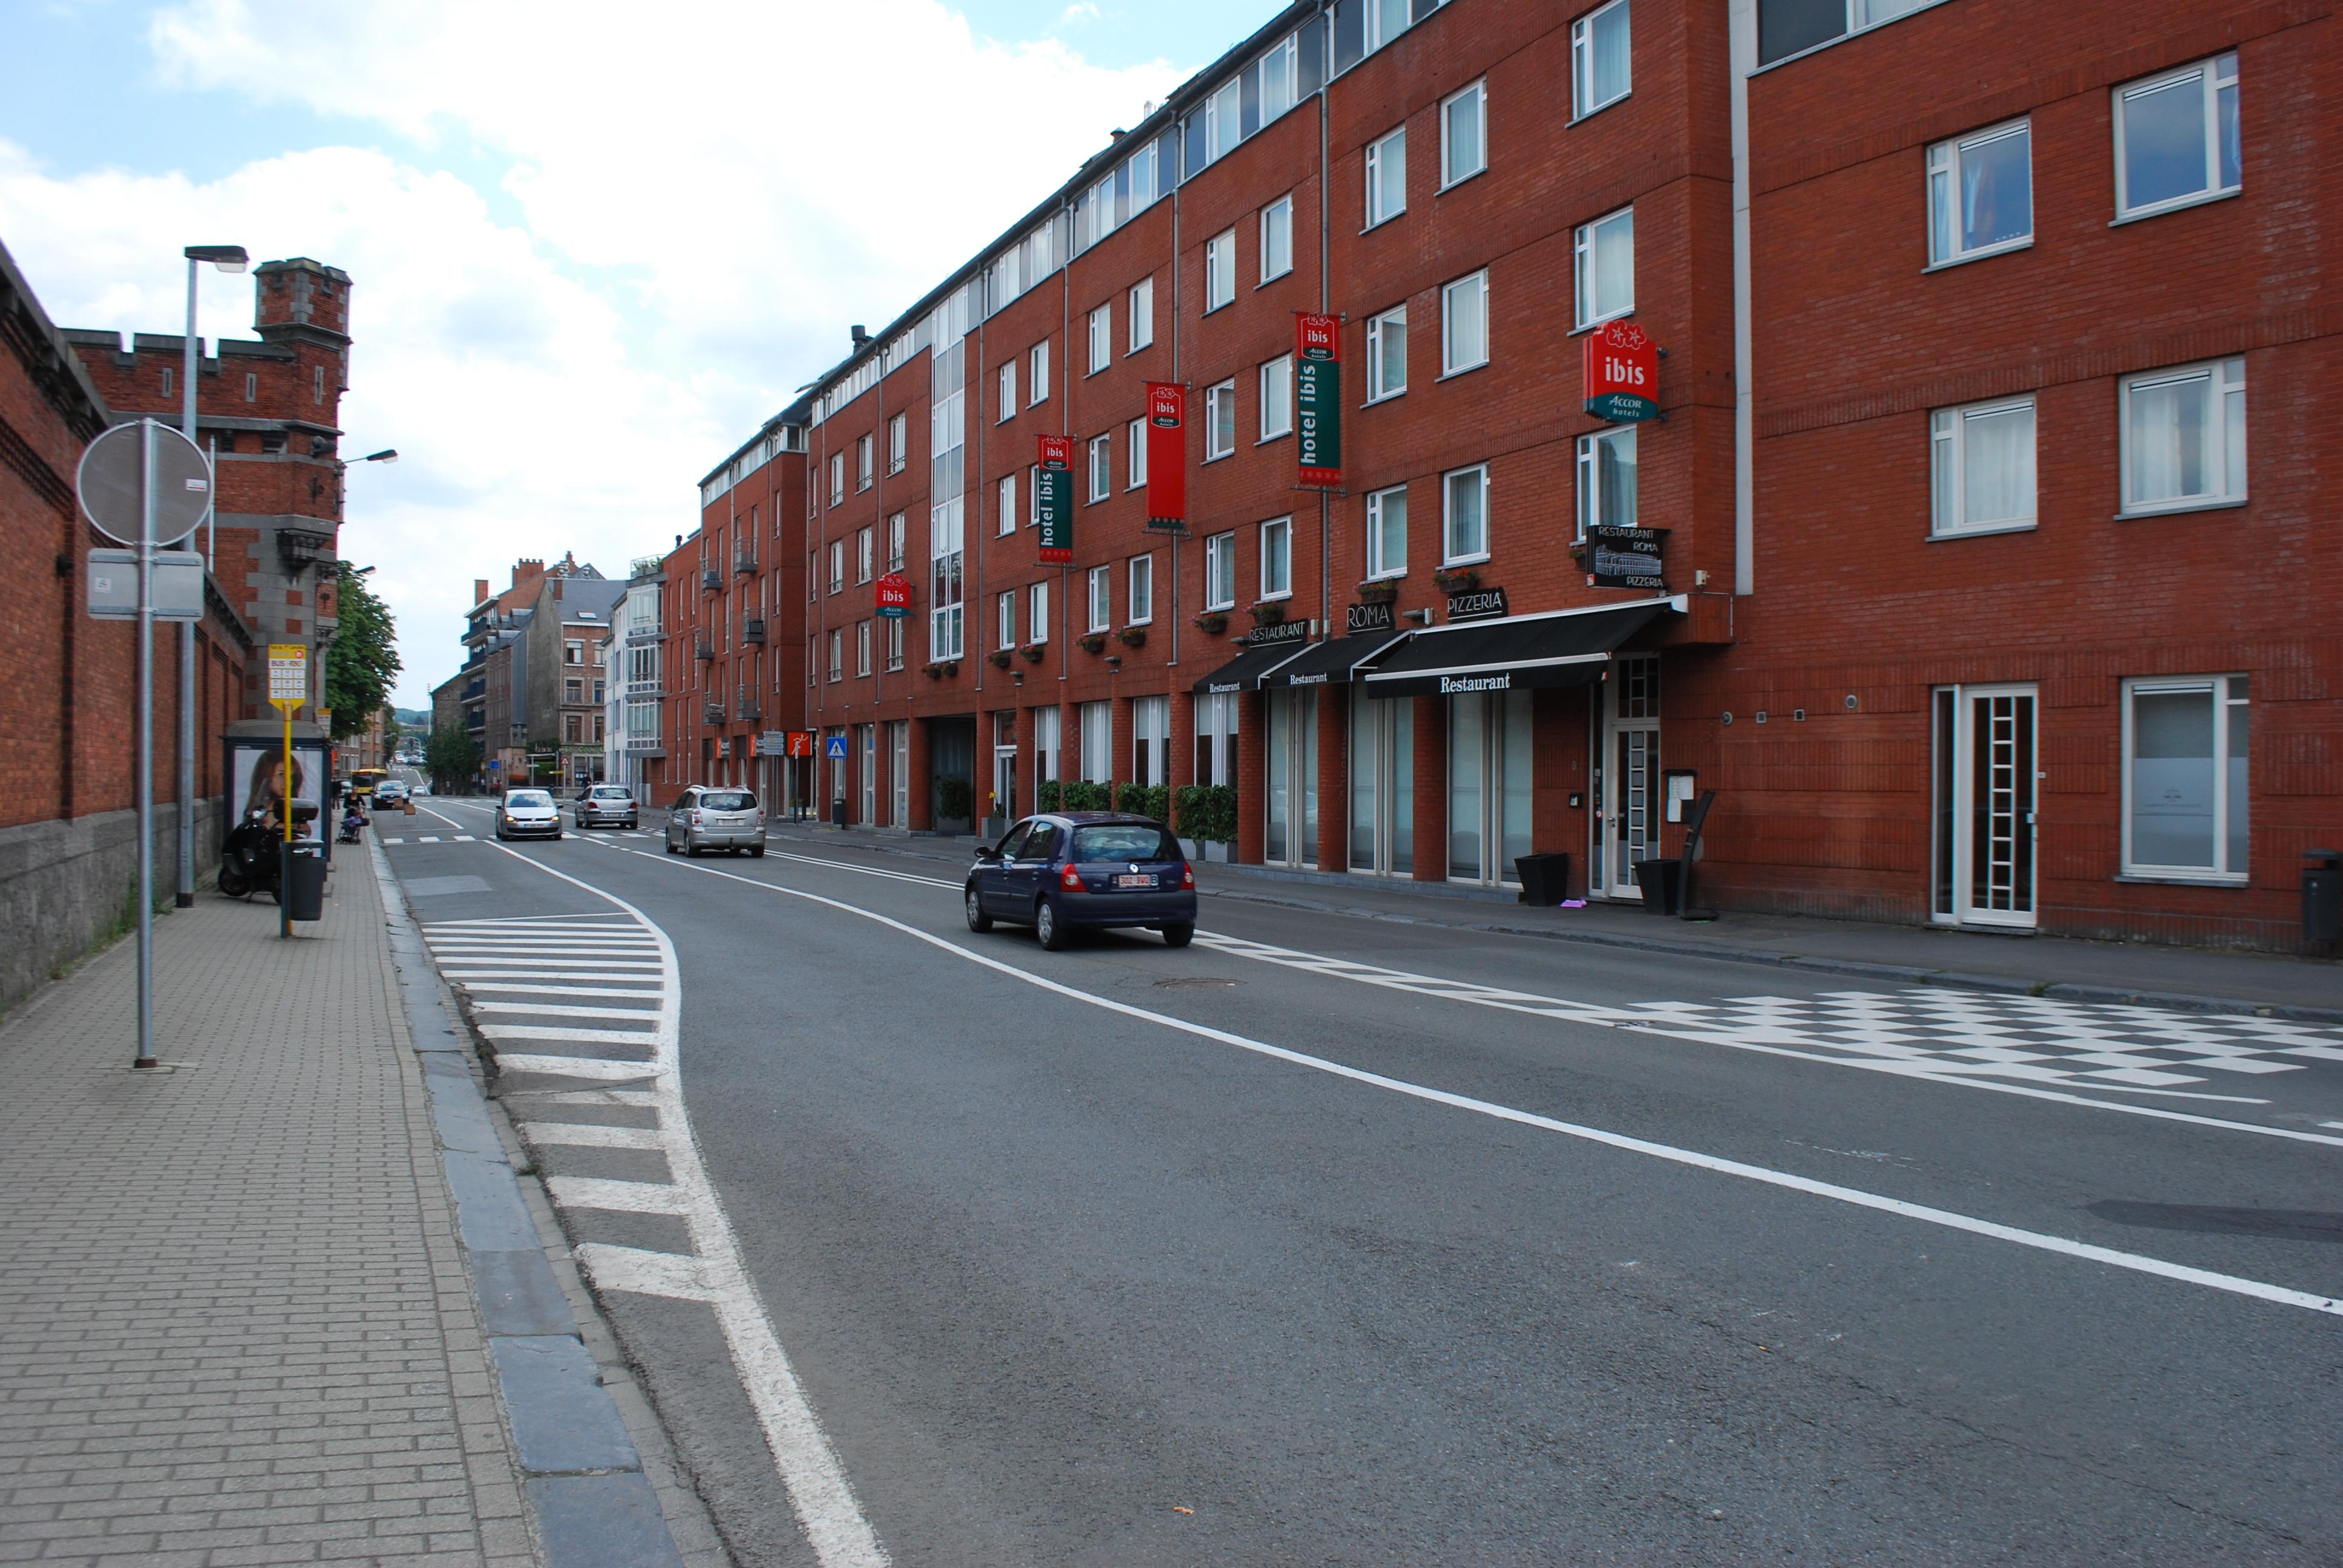 Hotel Ibis Rue De La Villette Lyon